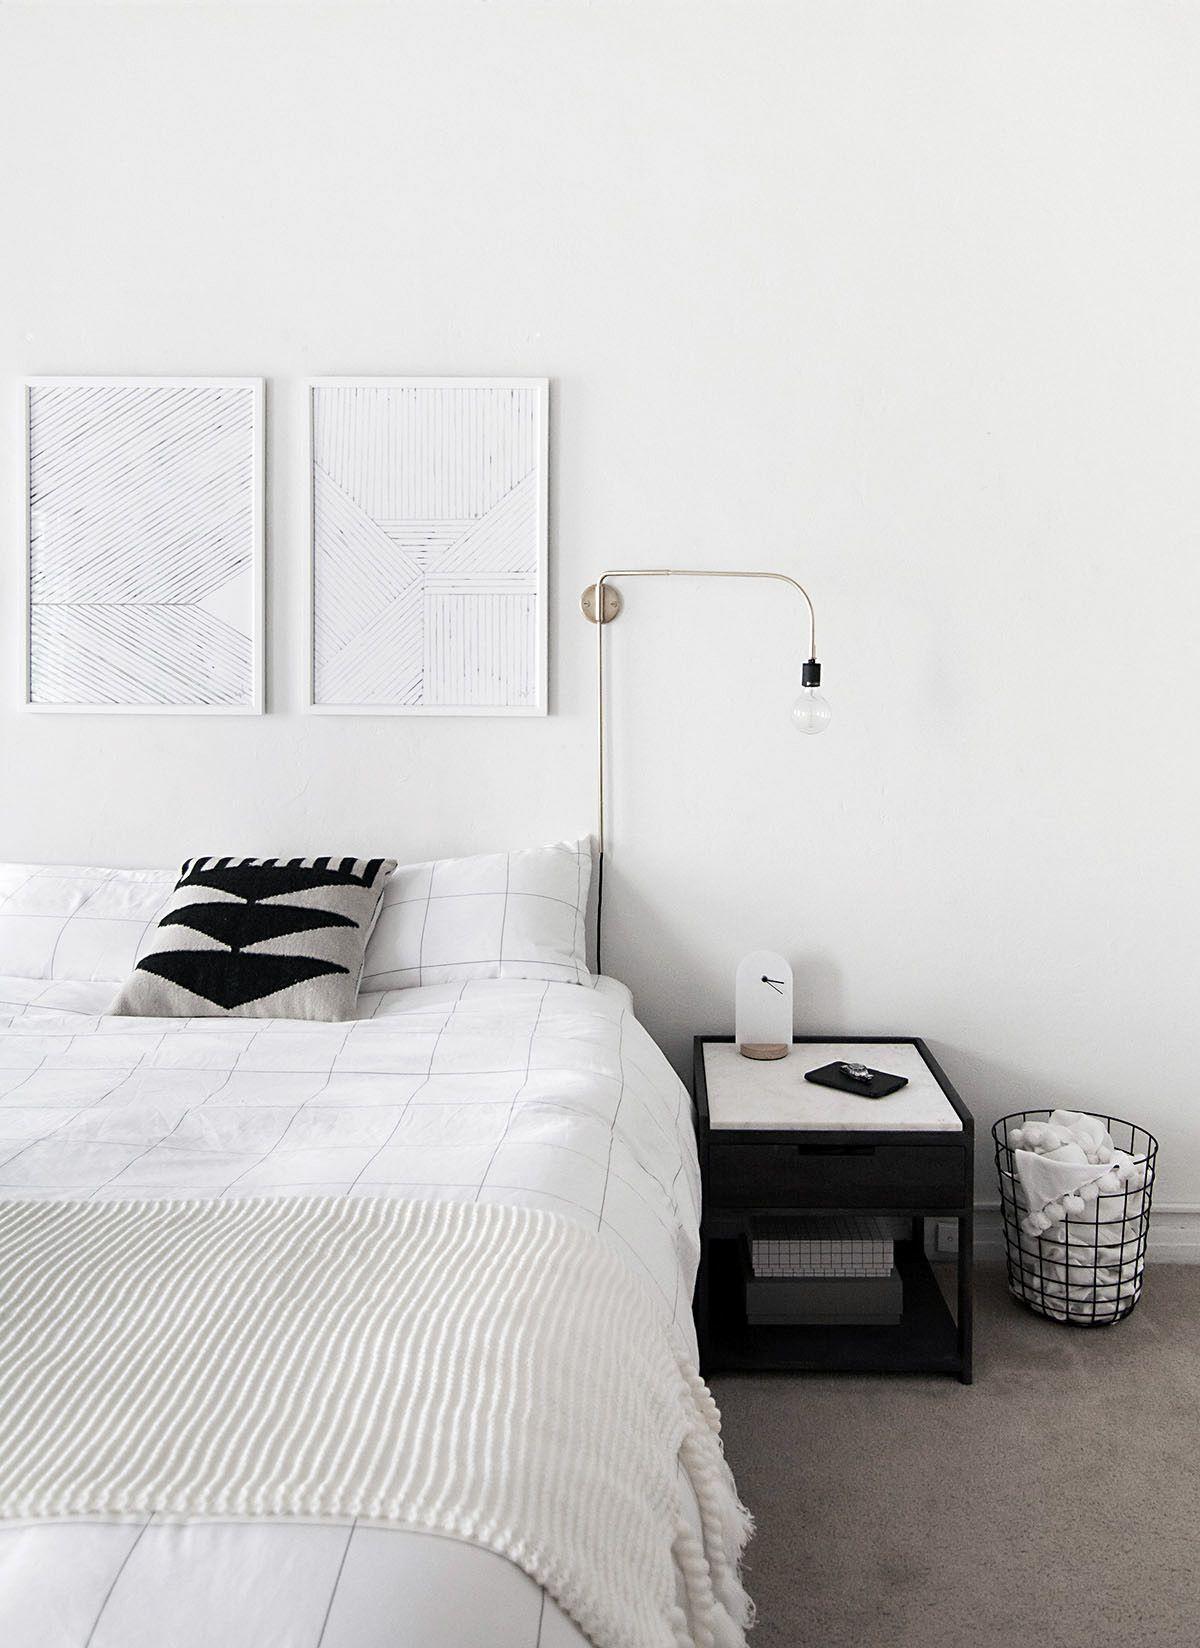 How To Achieve A Minimal Scandinavian Bedroom Homey Oh My Minimalist Bedroom Design Minimalist Bedroom Decor Bedroom Design